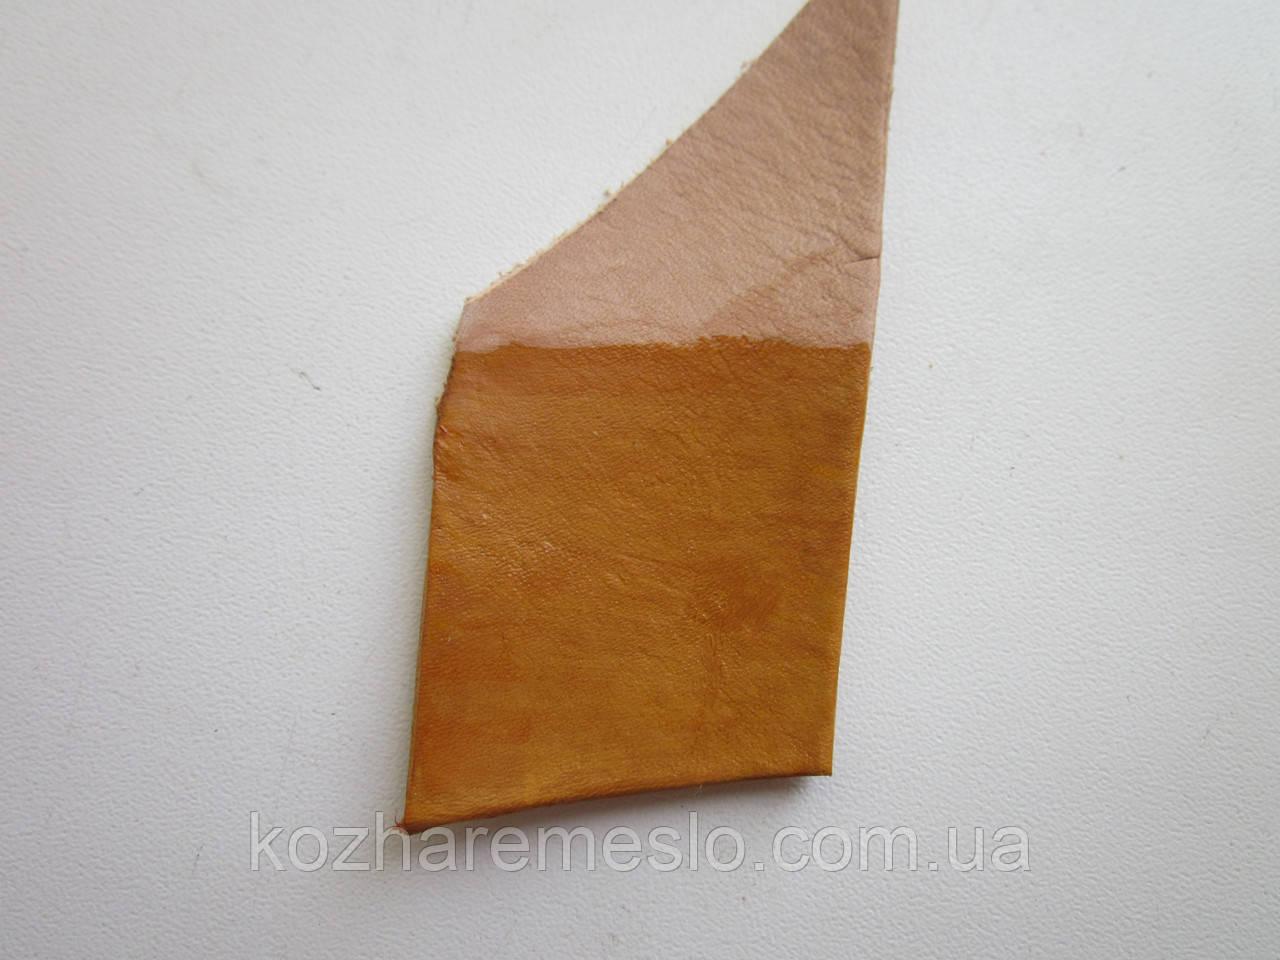 Краска для кожи WATERSTAIN Fenice на водной основе 50 мл светло - коричневая (Италия)